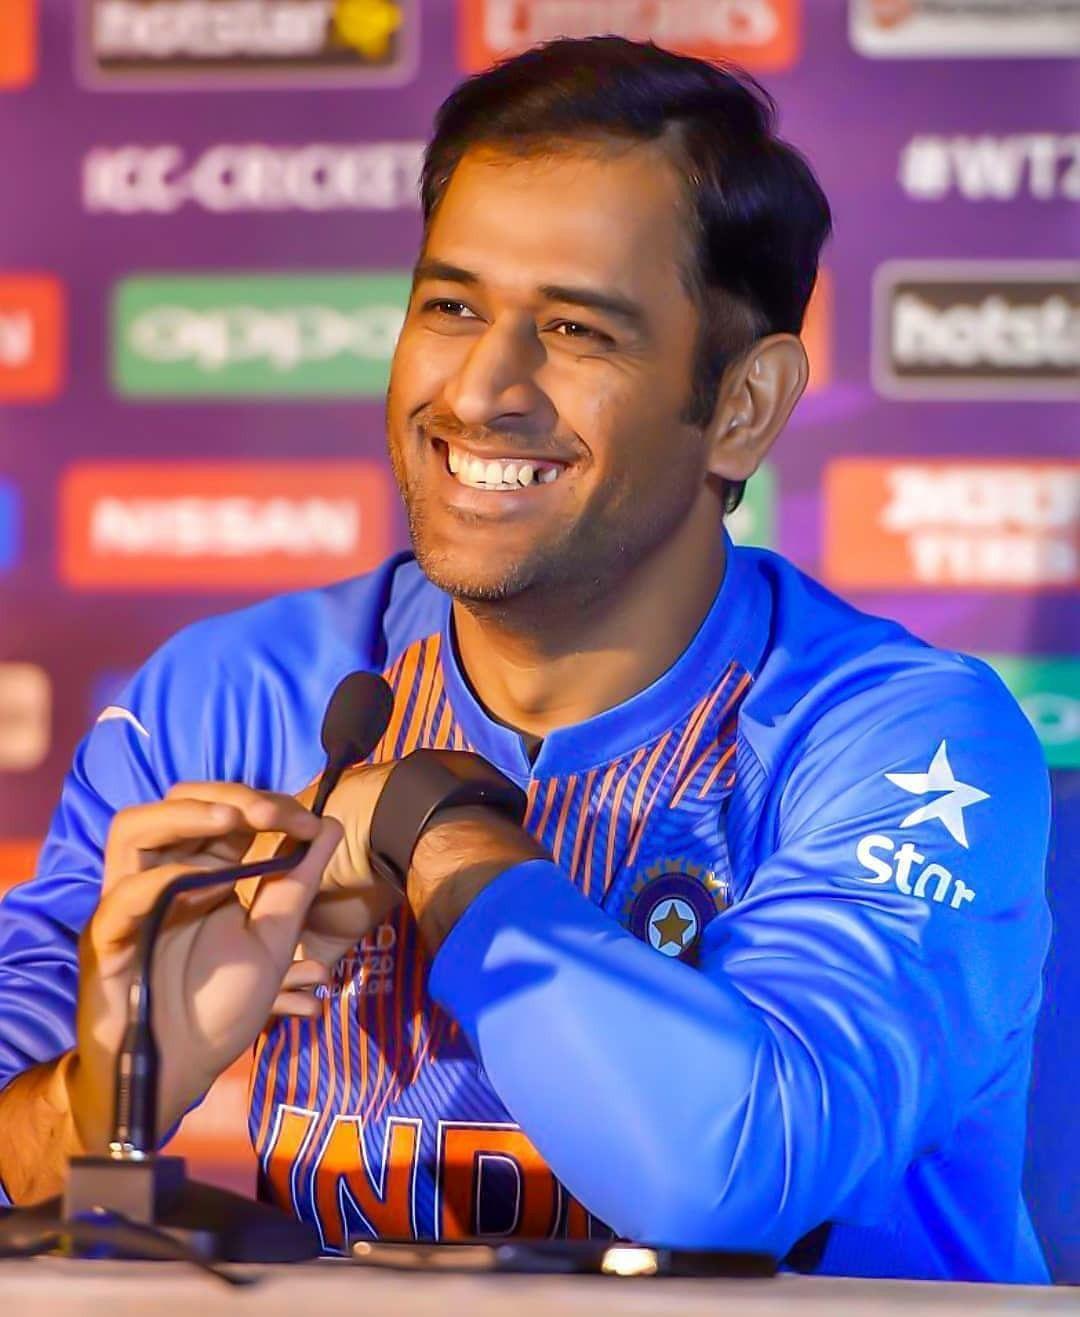 Mahi ÇÅ🏏 Ms dhoni wallpapers, Dhoni wallpapers, Cricket